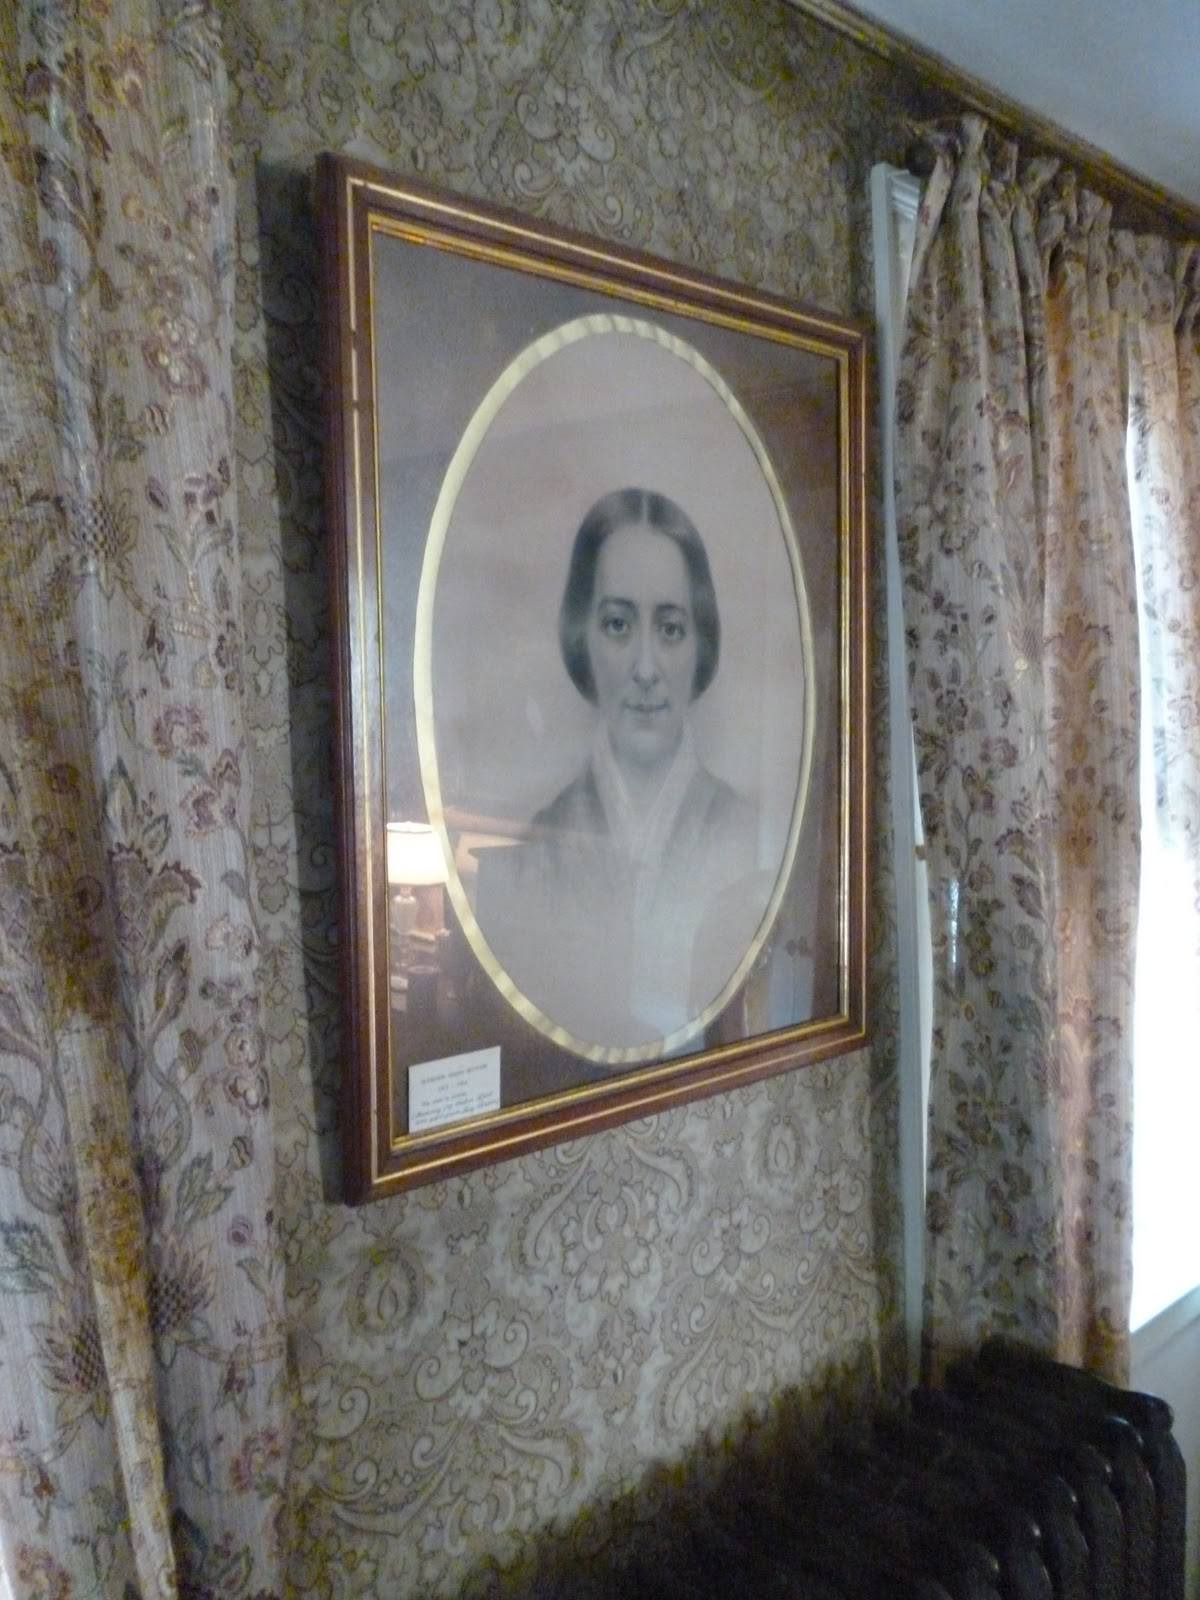 Whittier Living Room Interior Decorator: Dr Tony Shaw: John Greenleaf Whittier (again) In Amesbury